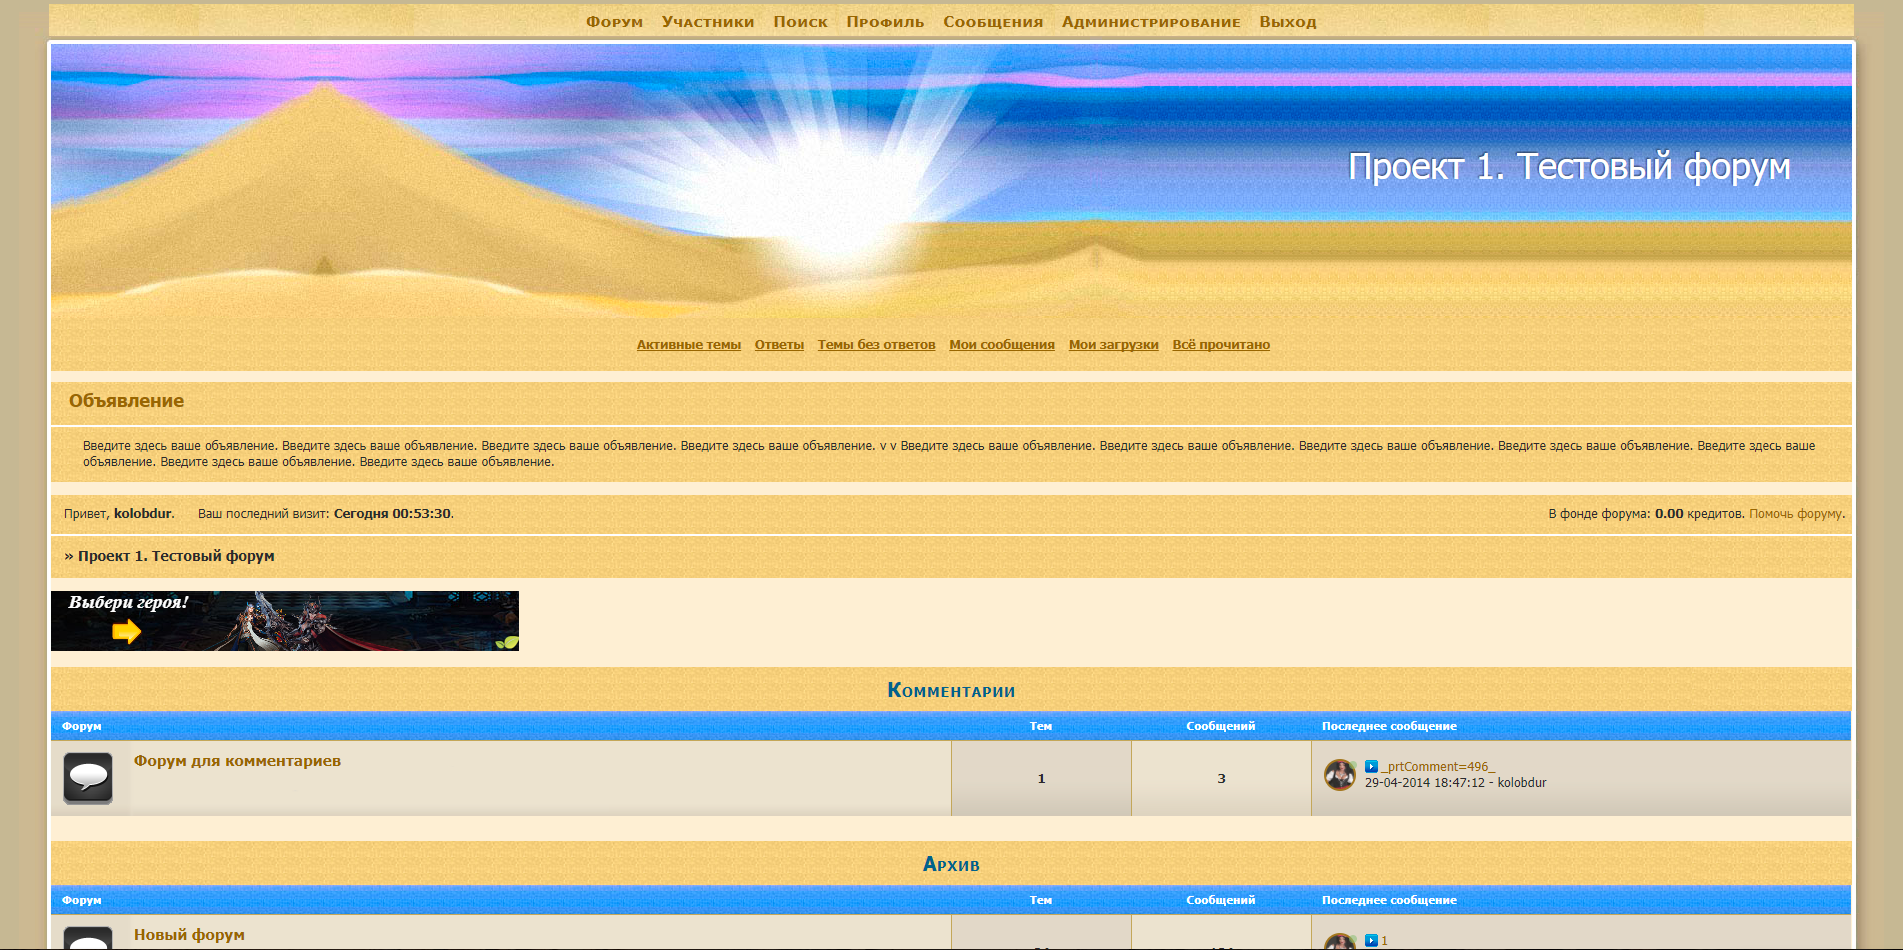 http://s0.uploads.ru/GlbrO.png